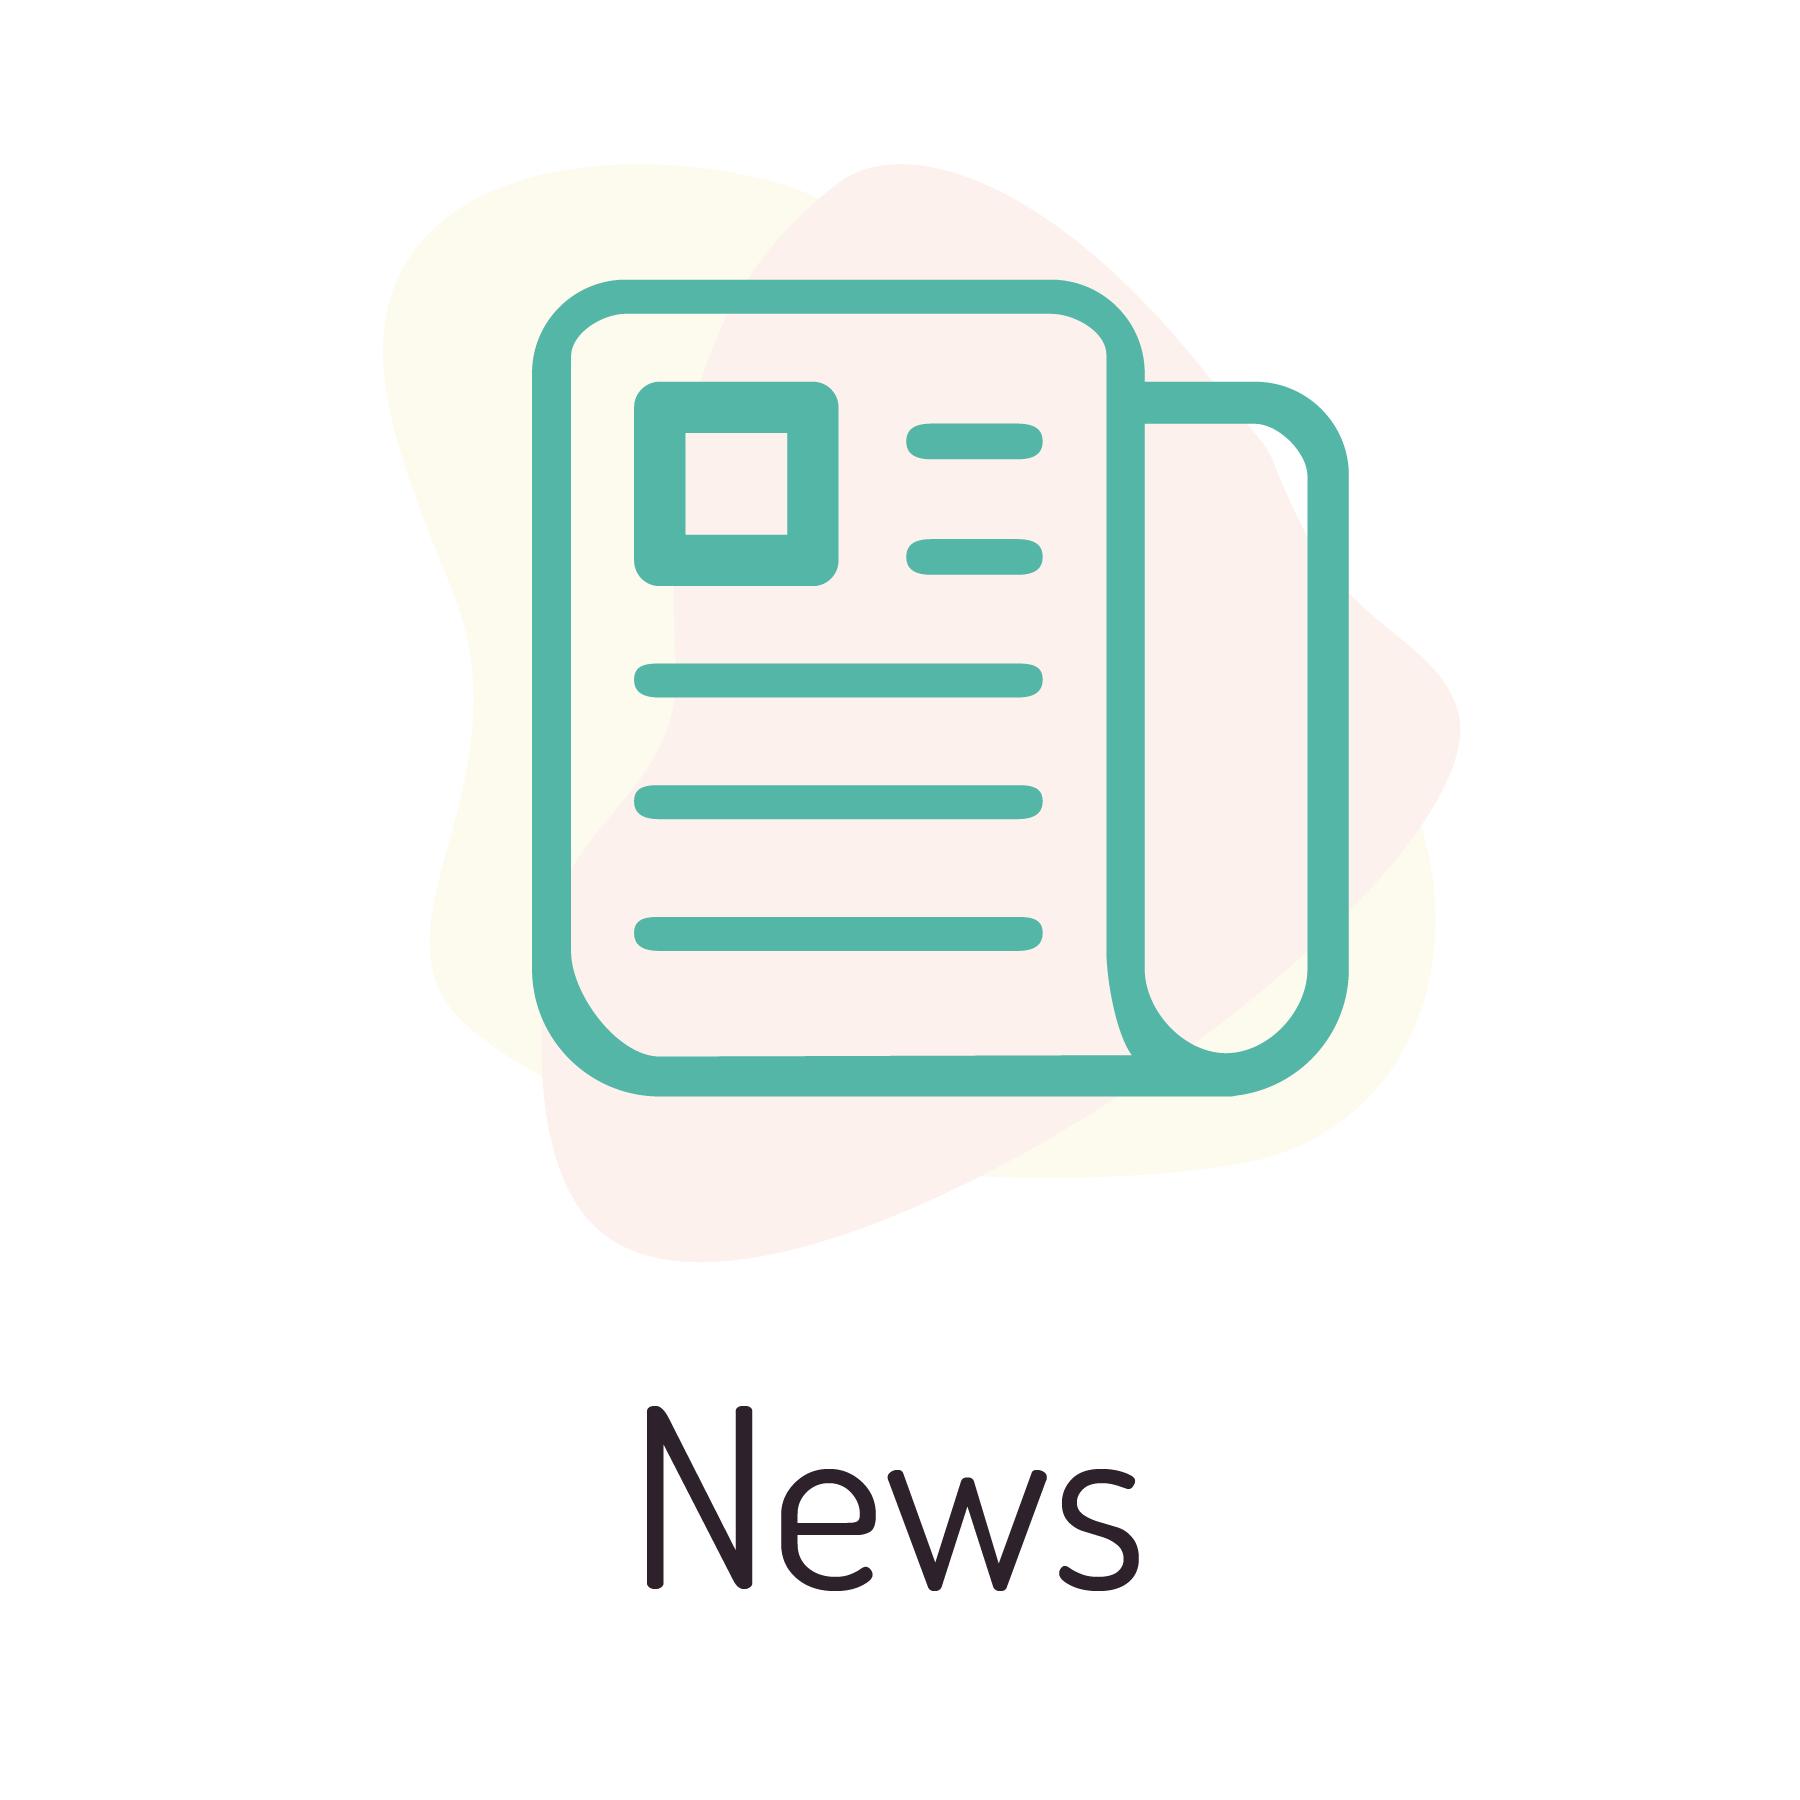 TEL News Icon